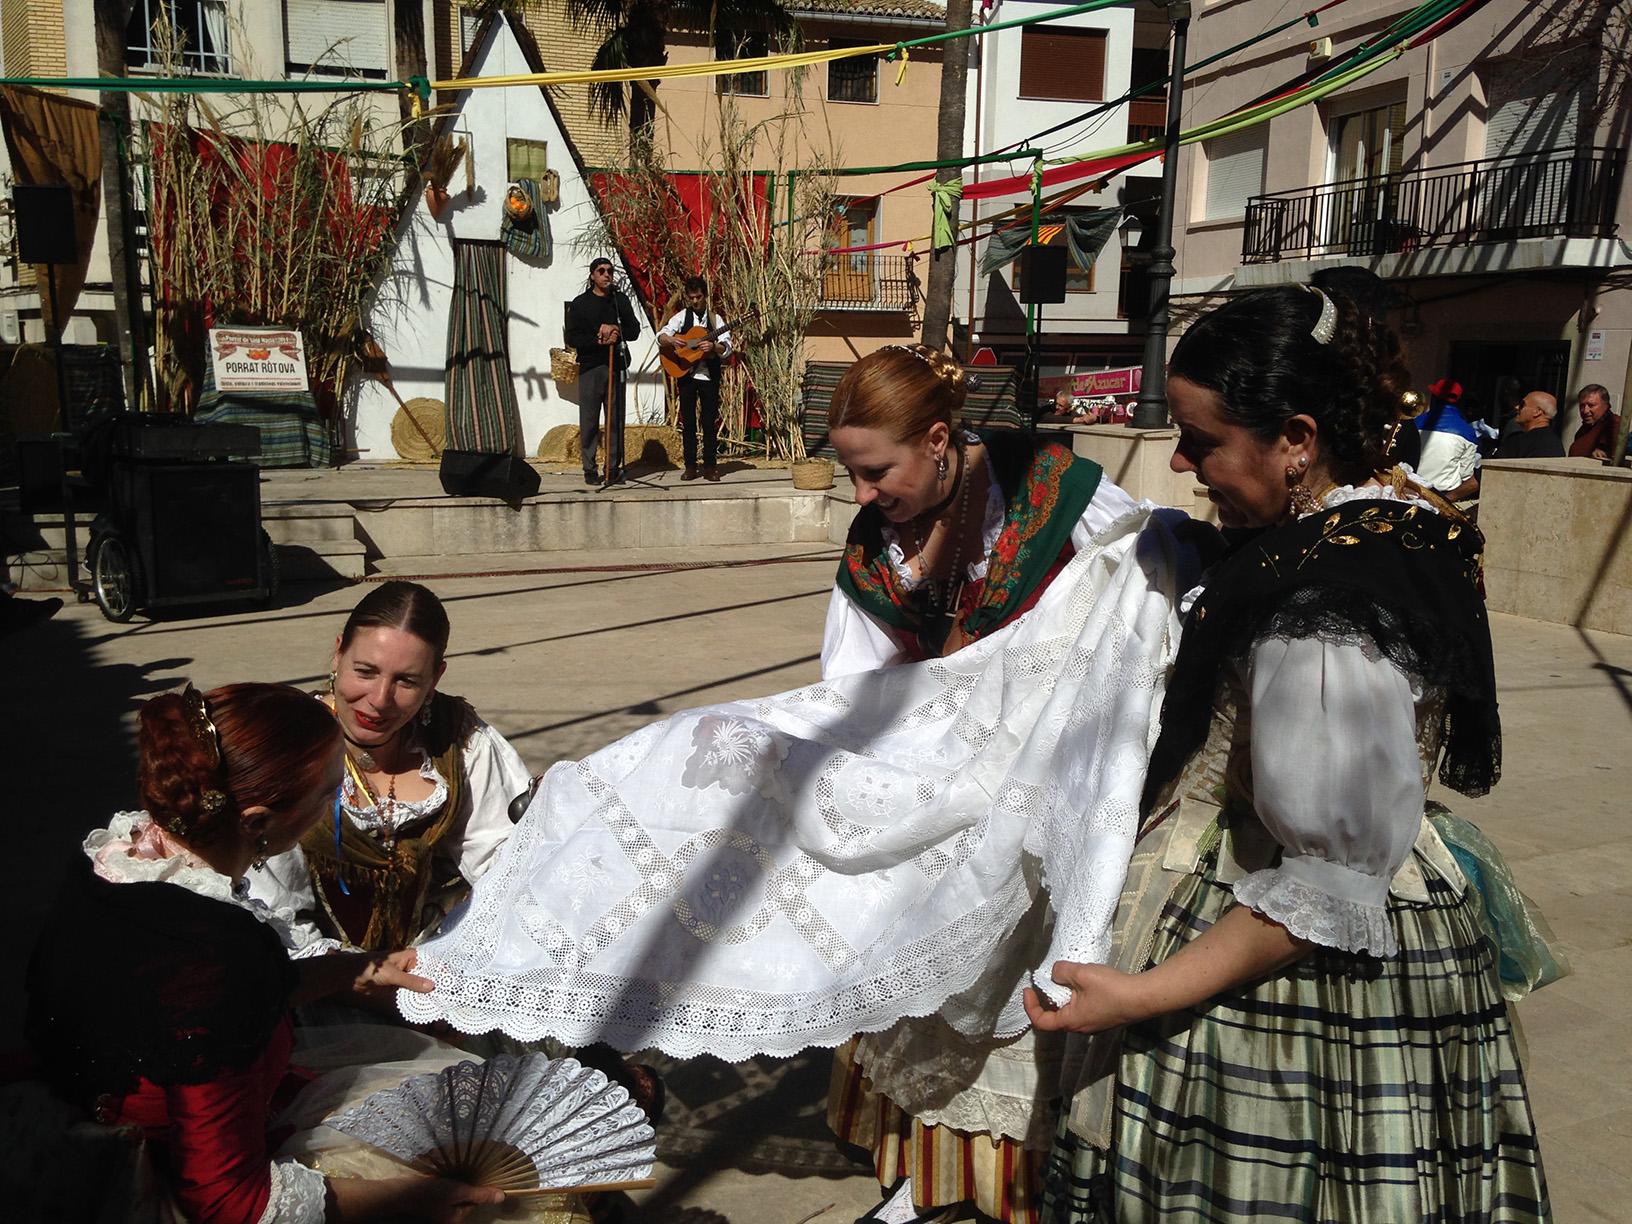 2014-02-22 - Baladre a Fira St. Marcia-ROTOVA (17)